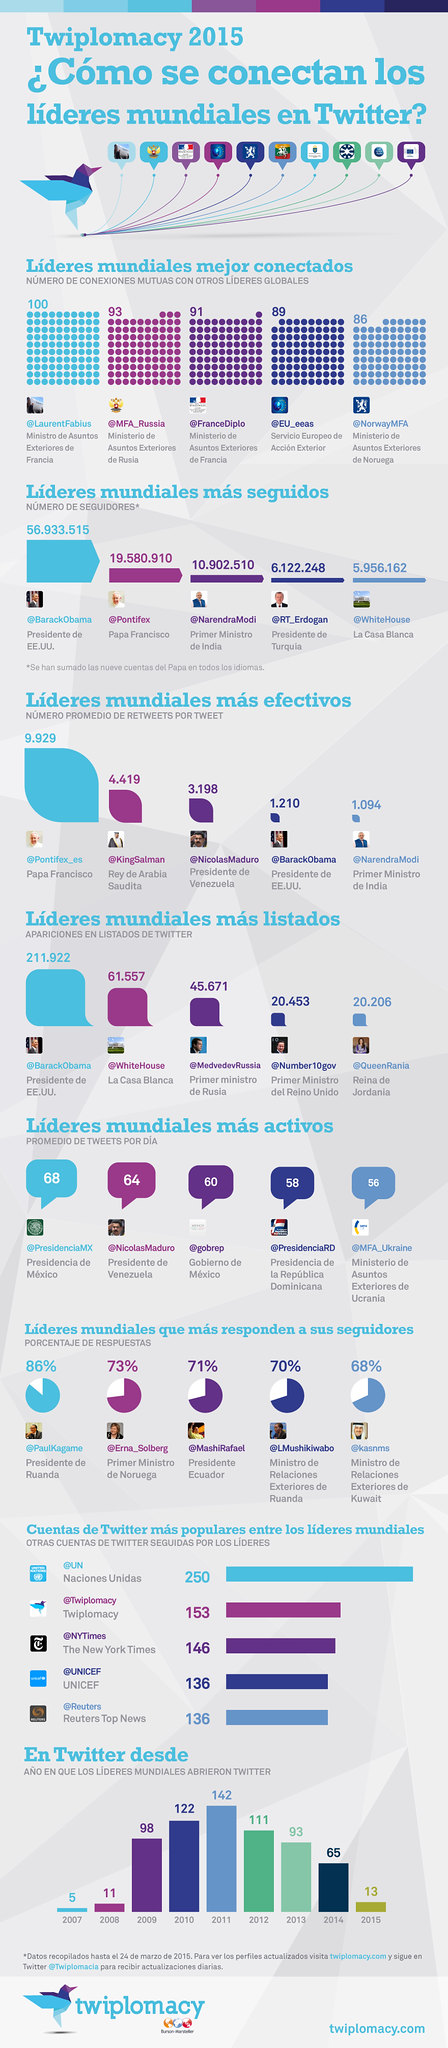 Twiplomacy_2015_Global_Infographic_Spanish (1)